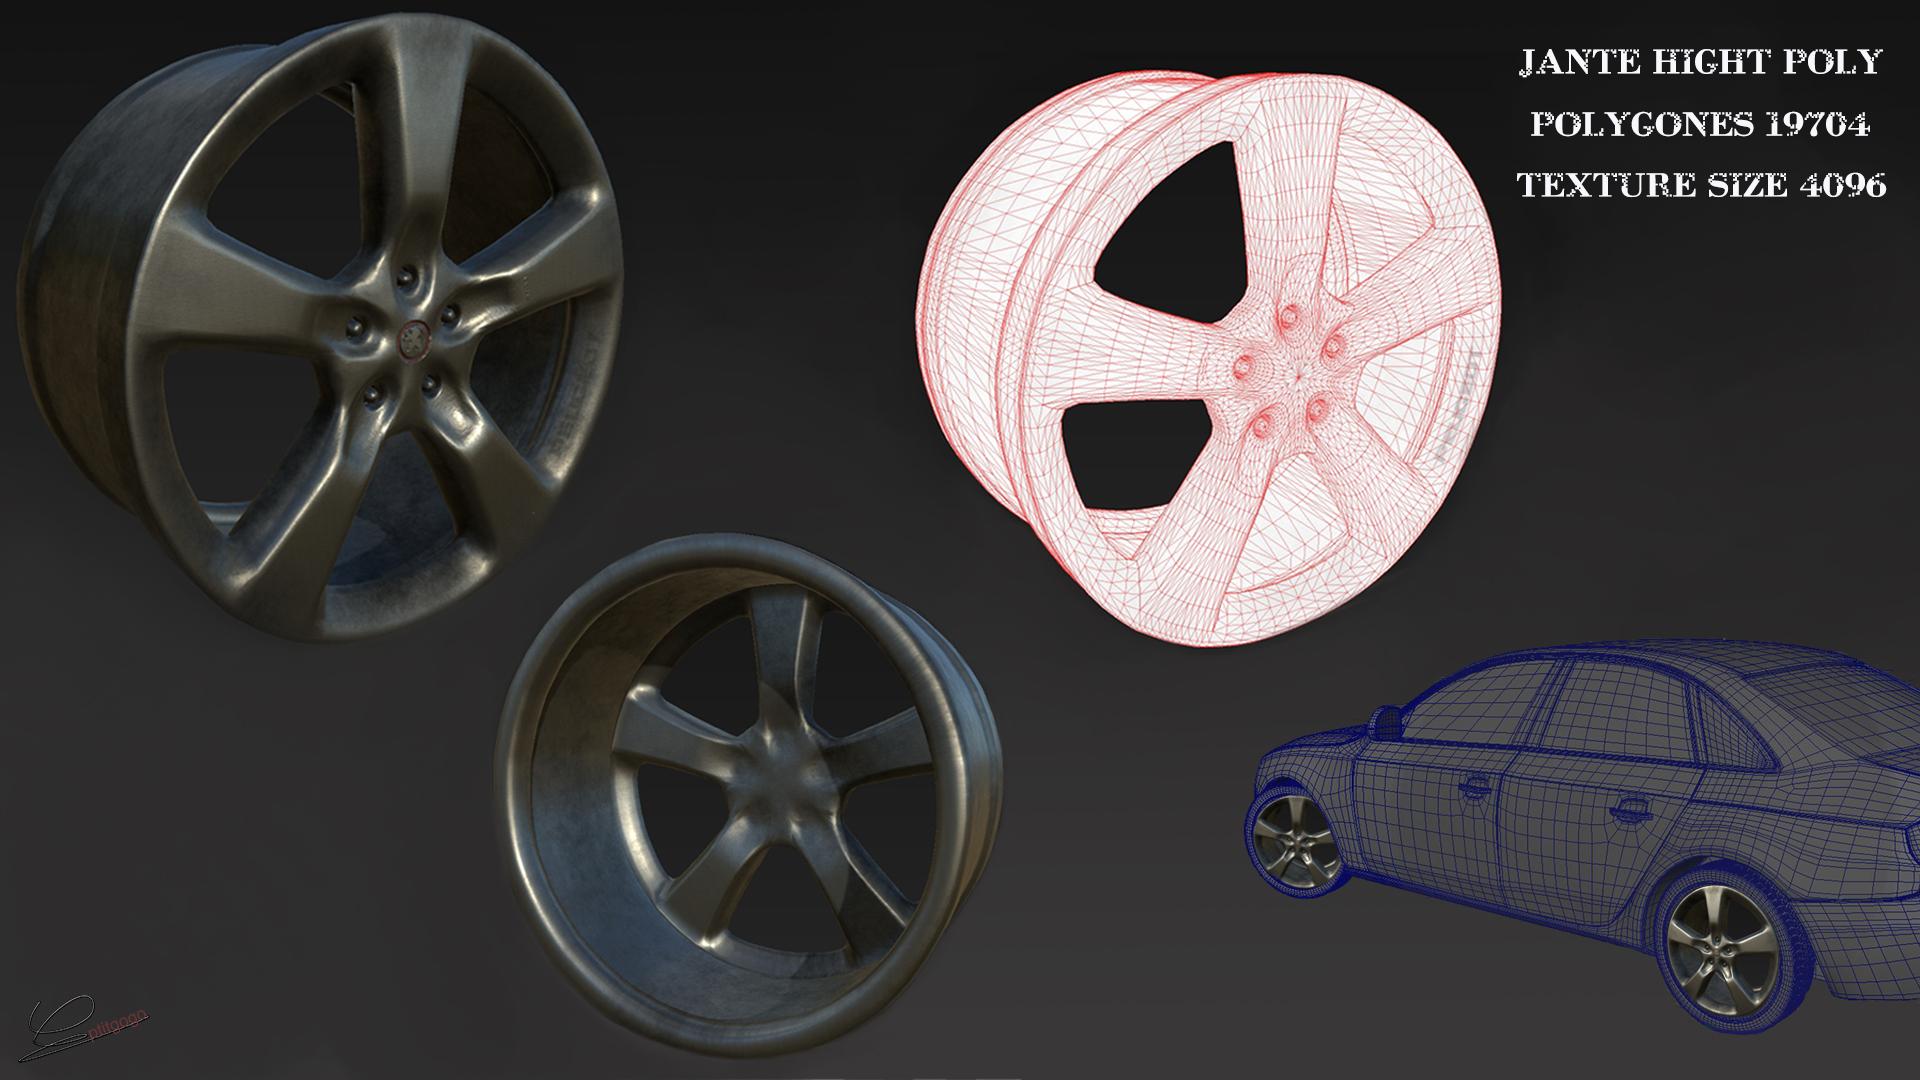 Peugeot wheel